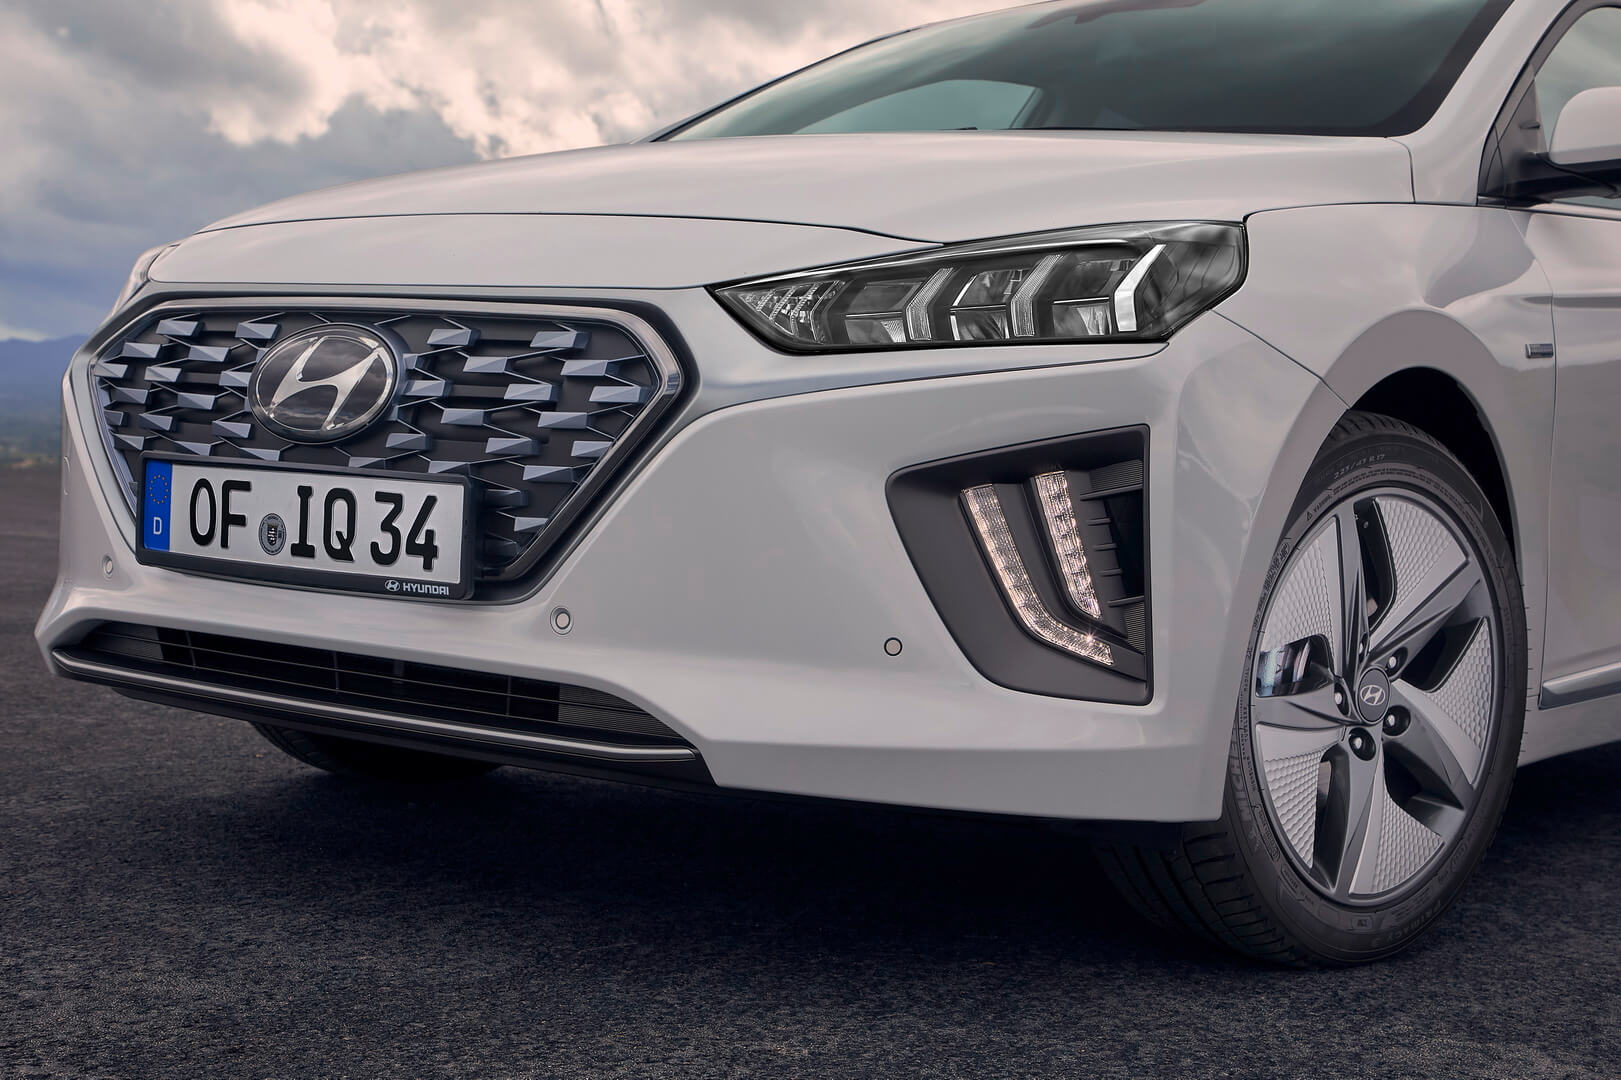 Hyundai IONIQ Hybrid 2019 получил обновленную переднюю оптику